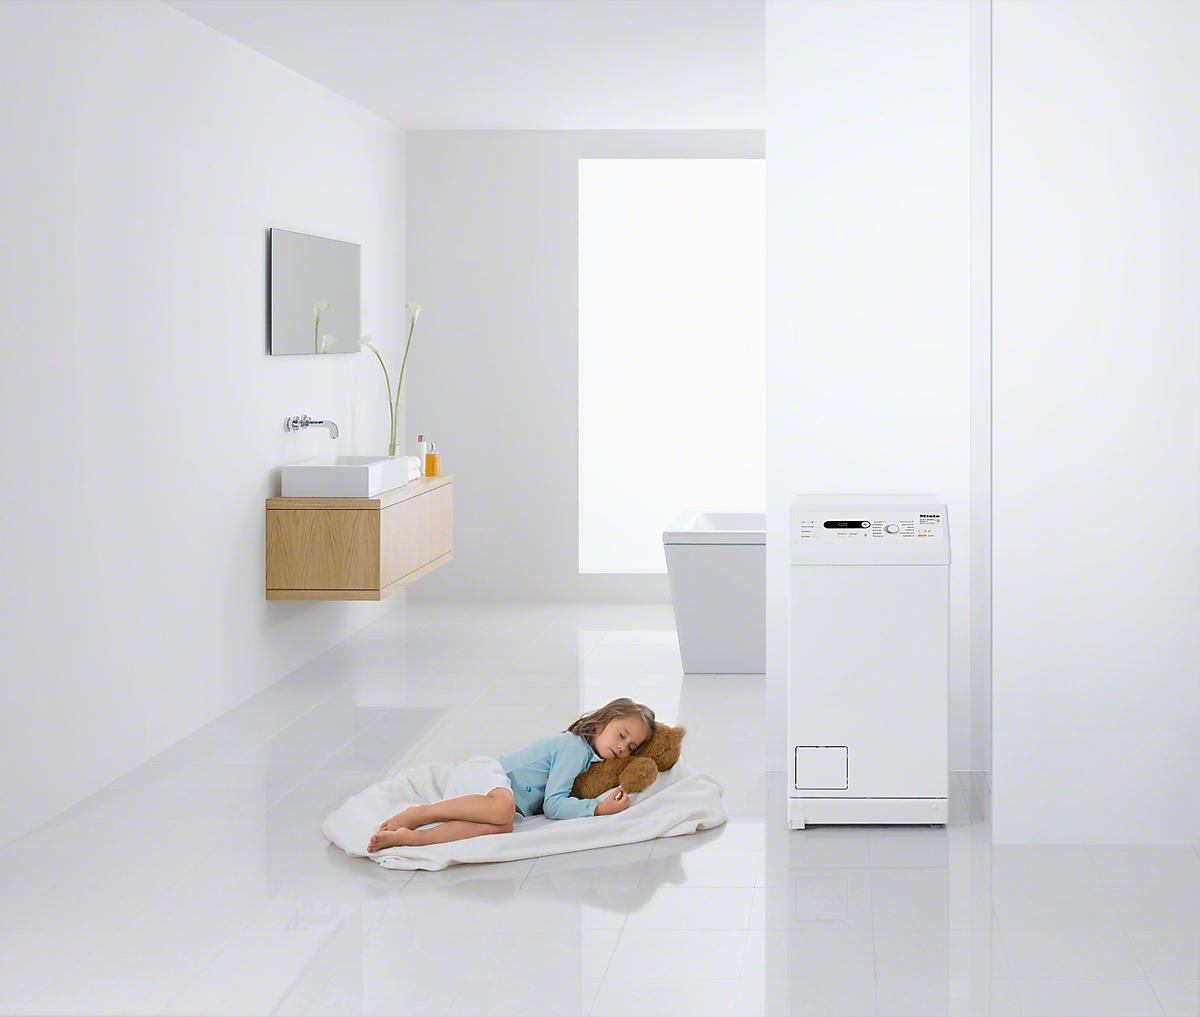 miele w 627 f wpm waschmaschine toplader. Black Bedroom Furniture Sets. Home Design Ideas